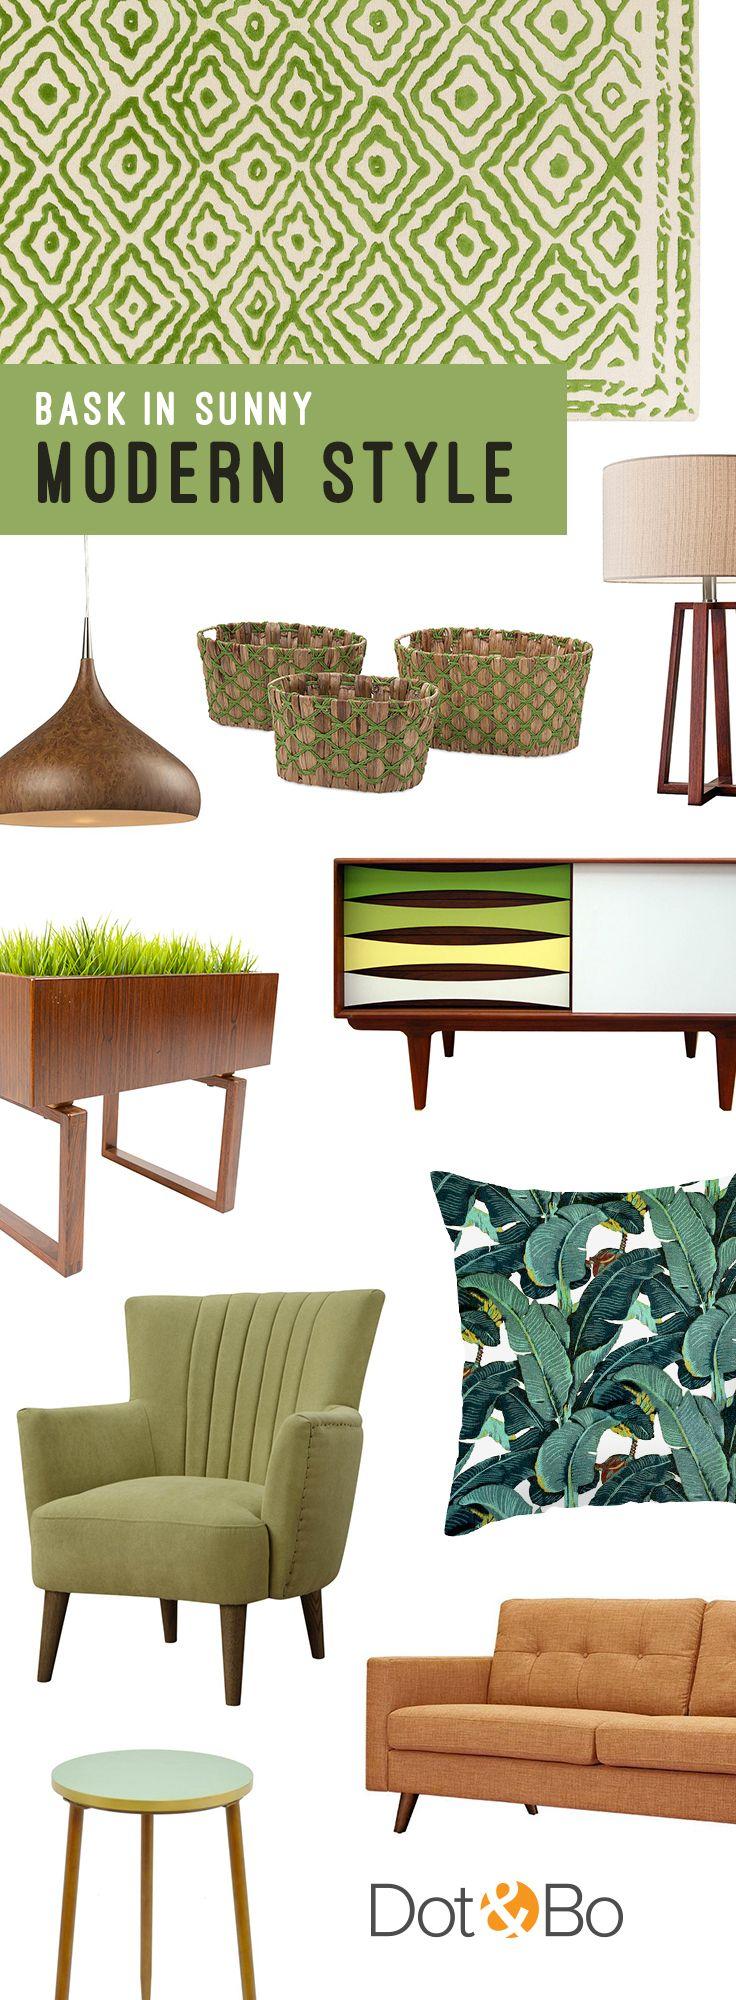 nature inspired furniture. modern natureinspired furniture u0026 dcor up to 60 off at dotandbo nature inspired e